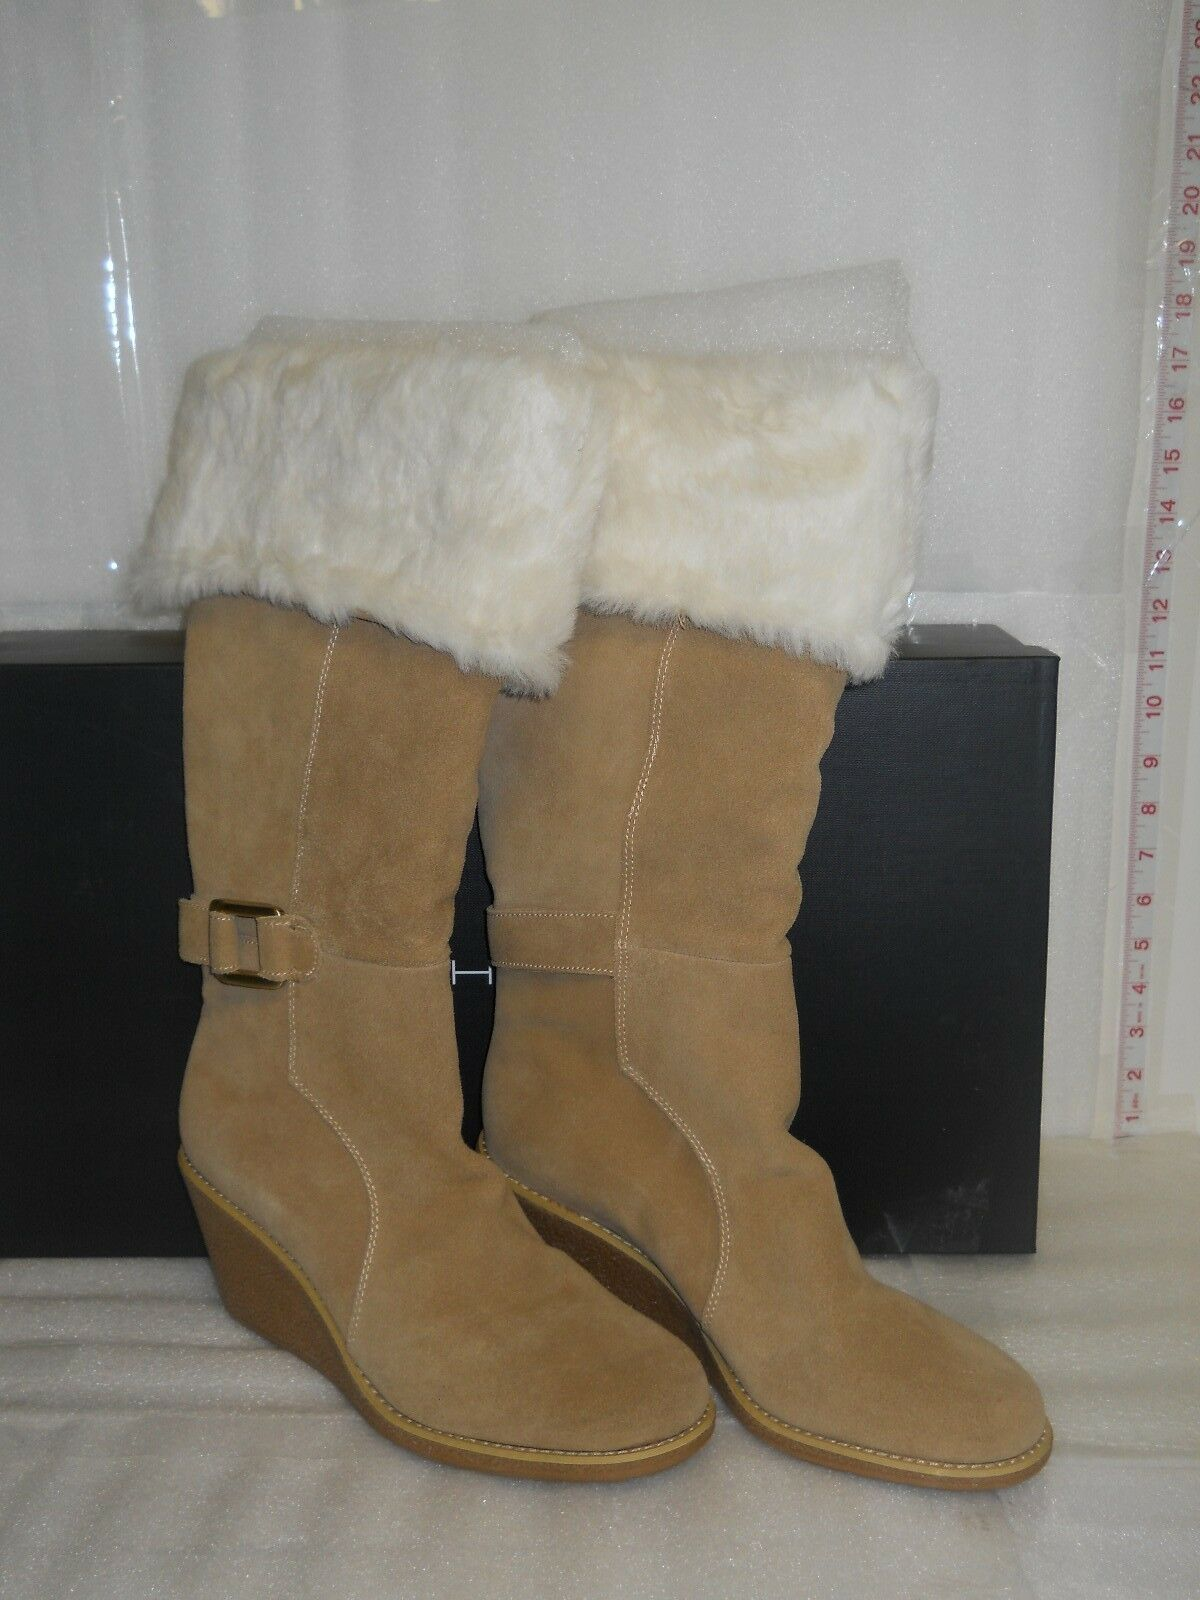 Tahari NEU Damenschuhe Jenny Camel Natural Wedge Leder Faux Fur Stiefel 8 M Schuhes